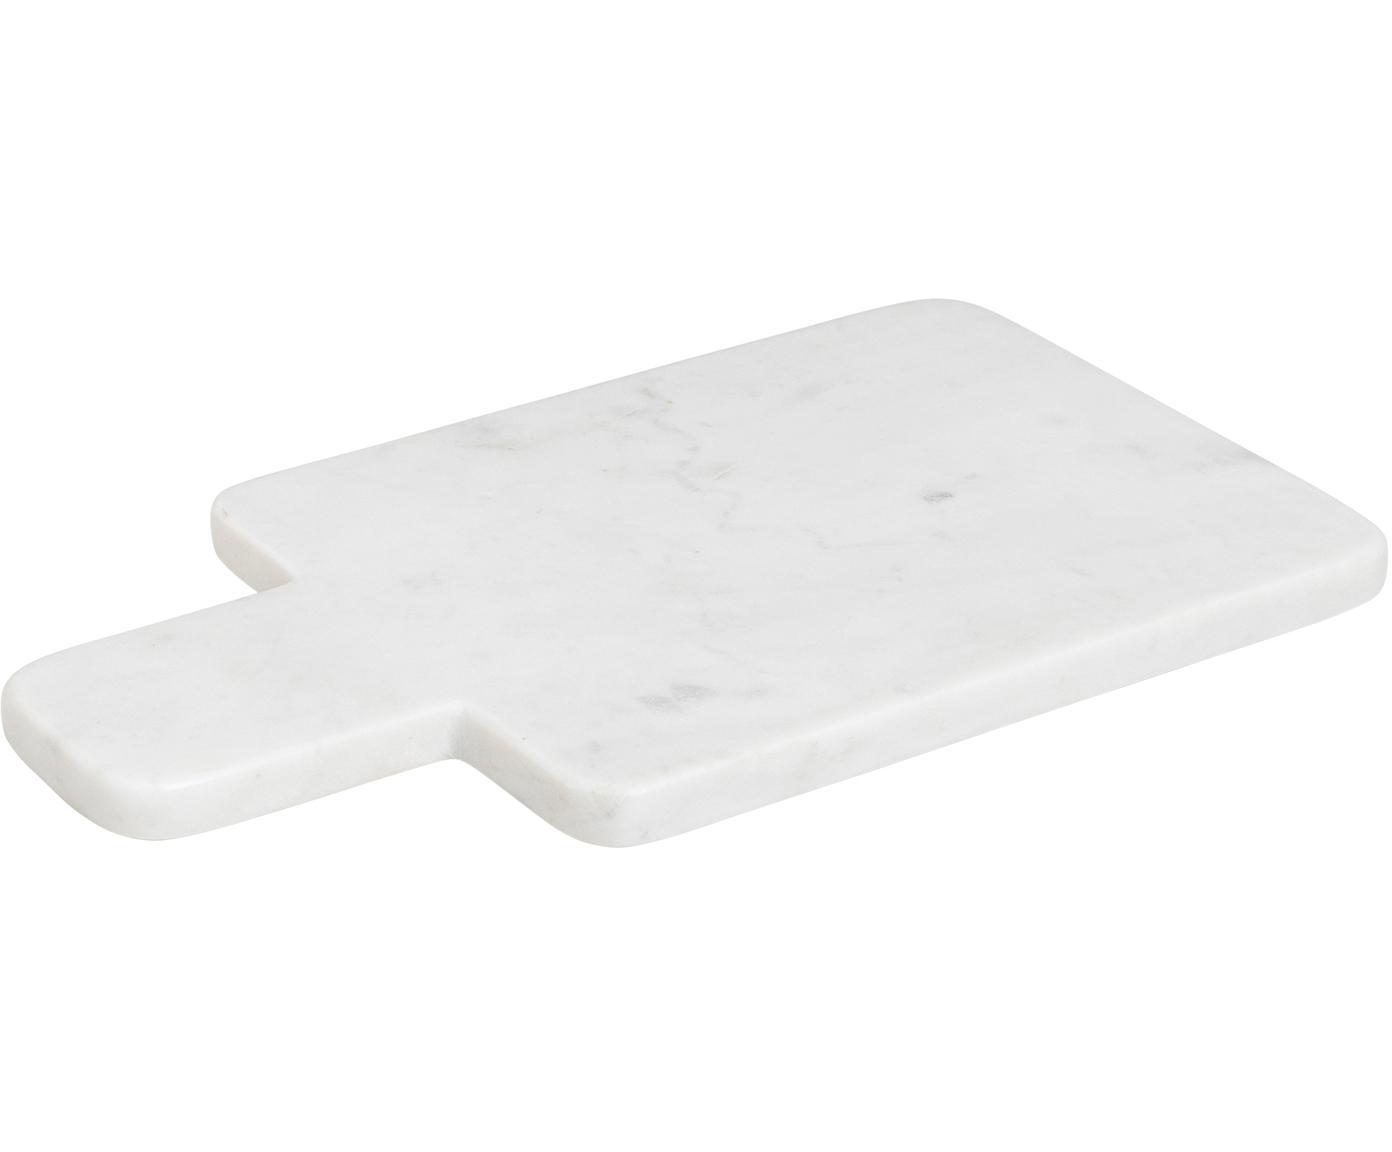 Tagliere in marmo Adam, Marmo, Bianco, Larg. 30 x Alt. 17 cm